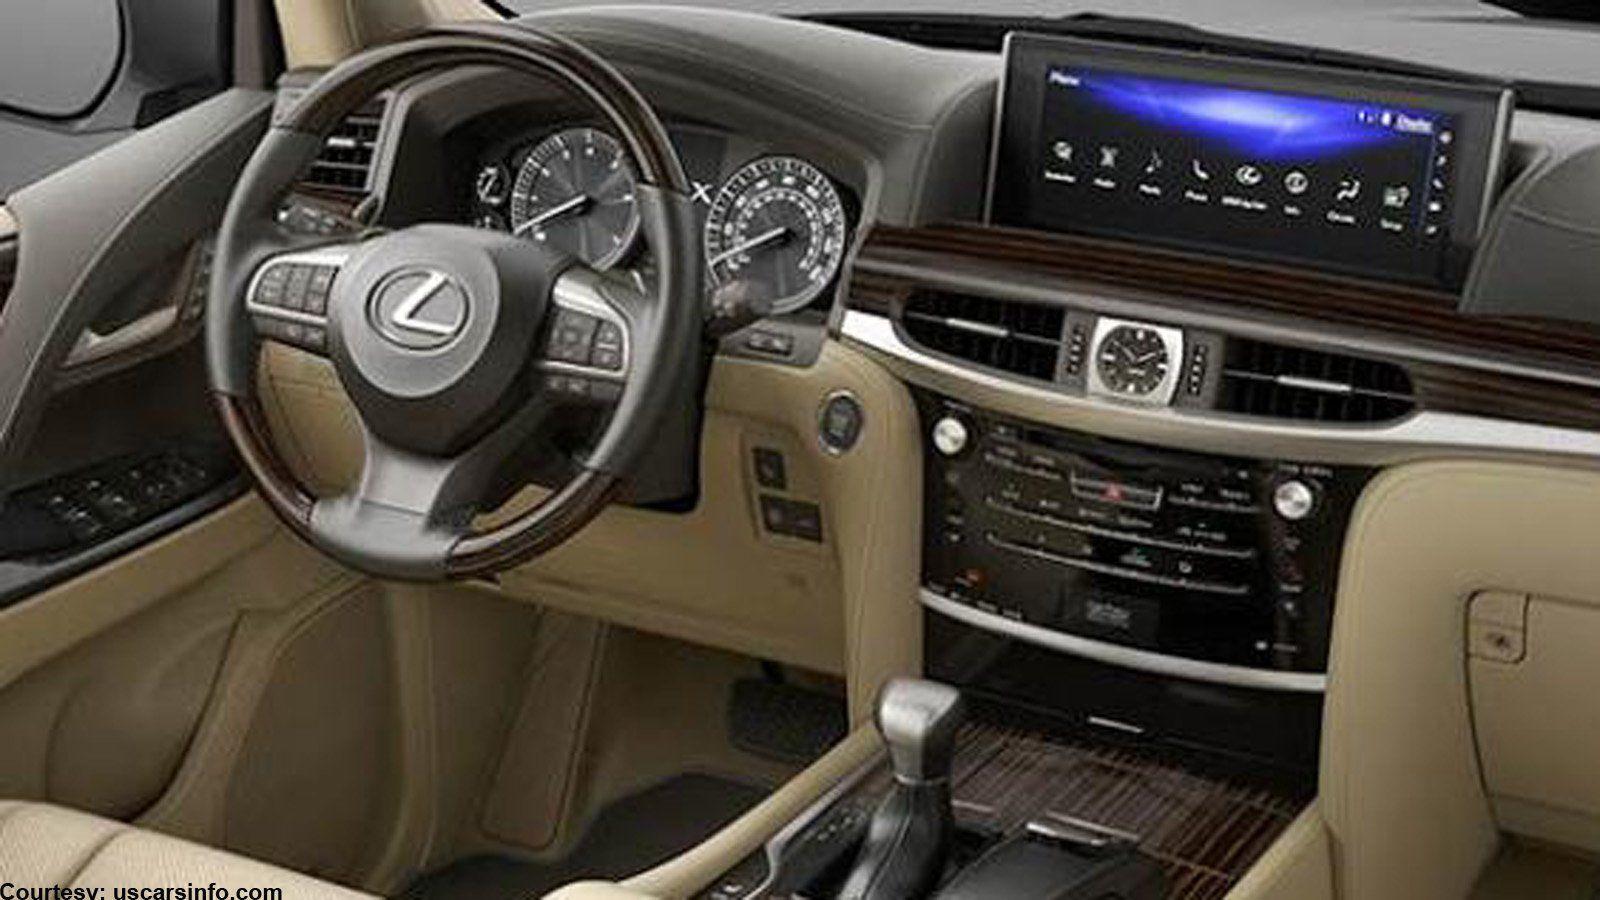 2018 lexus lx570 leather wrapped heated steering wheel